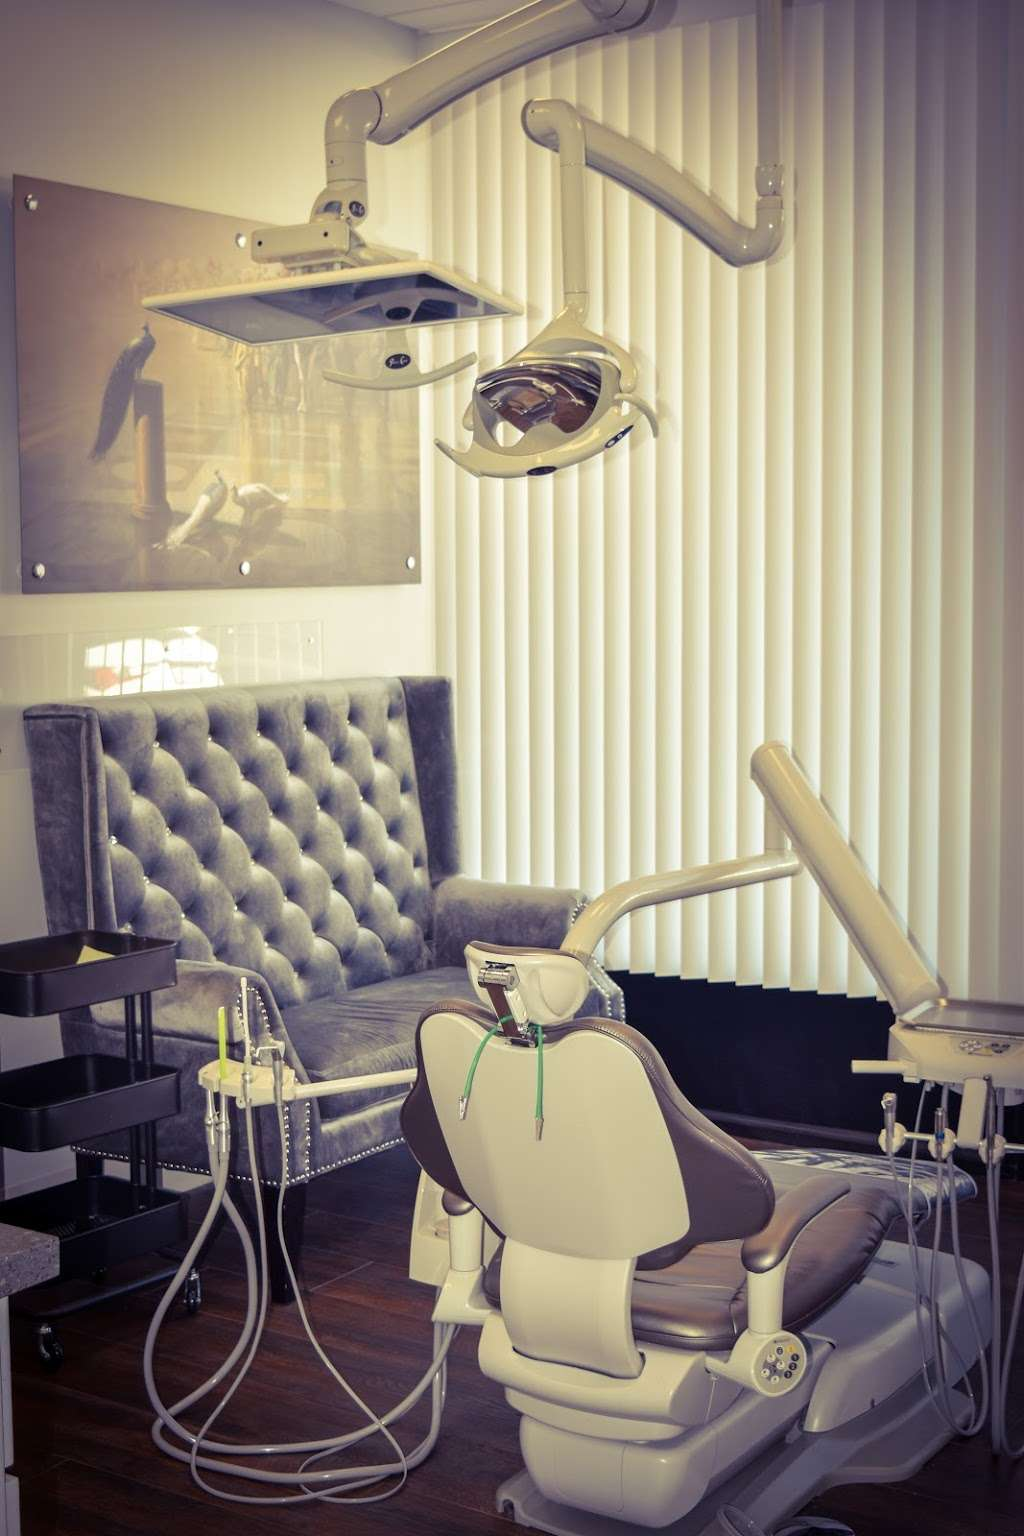 40/30 DENTAL - dentist  | Photo 9 of 10 | Address: 1166, El Cajon, CA 92021, USA | Phone: (619) 478-4030